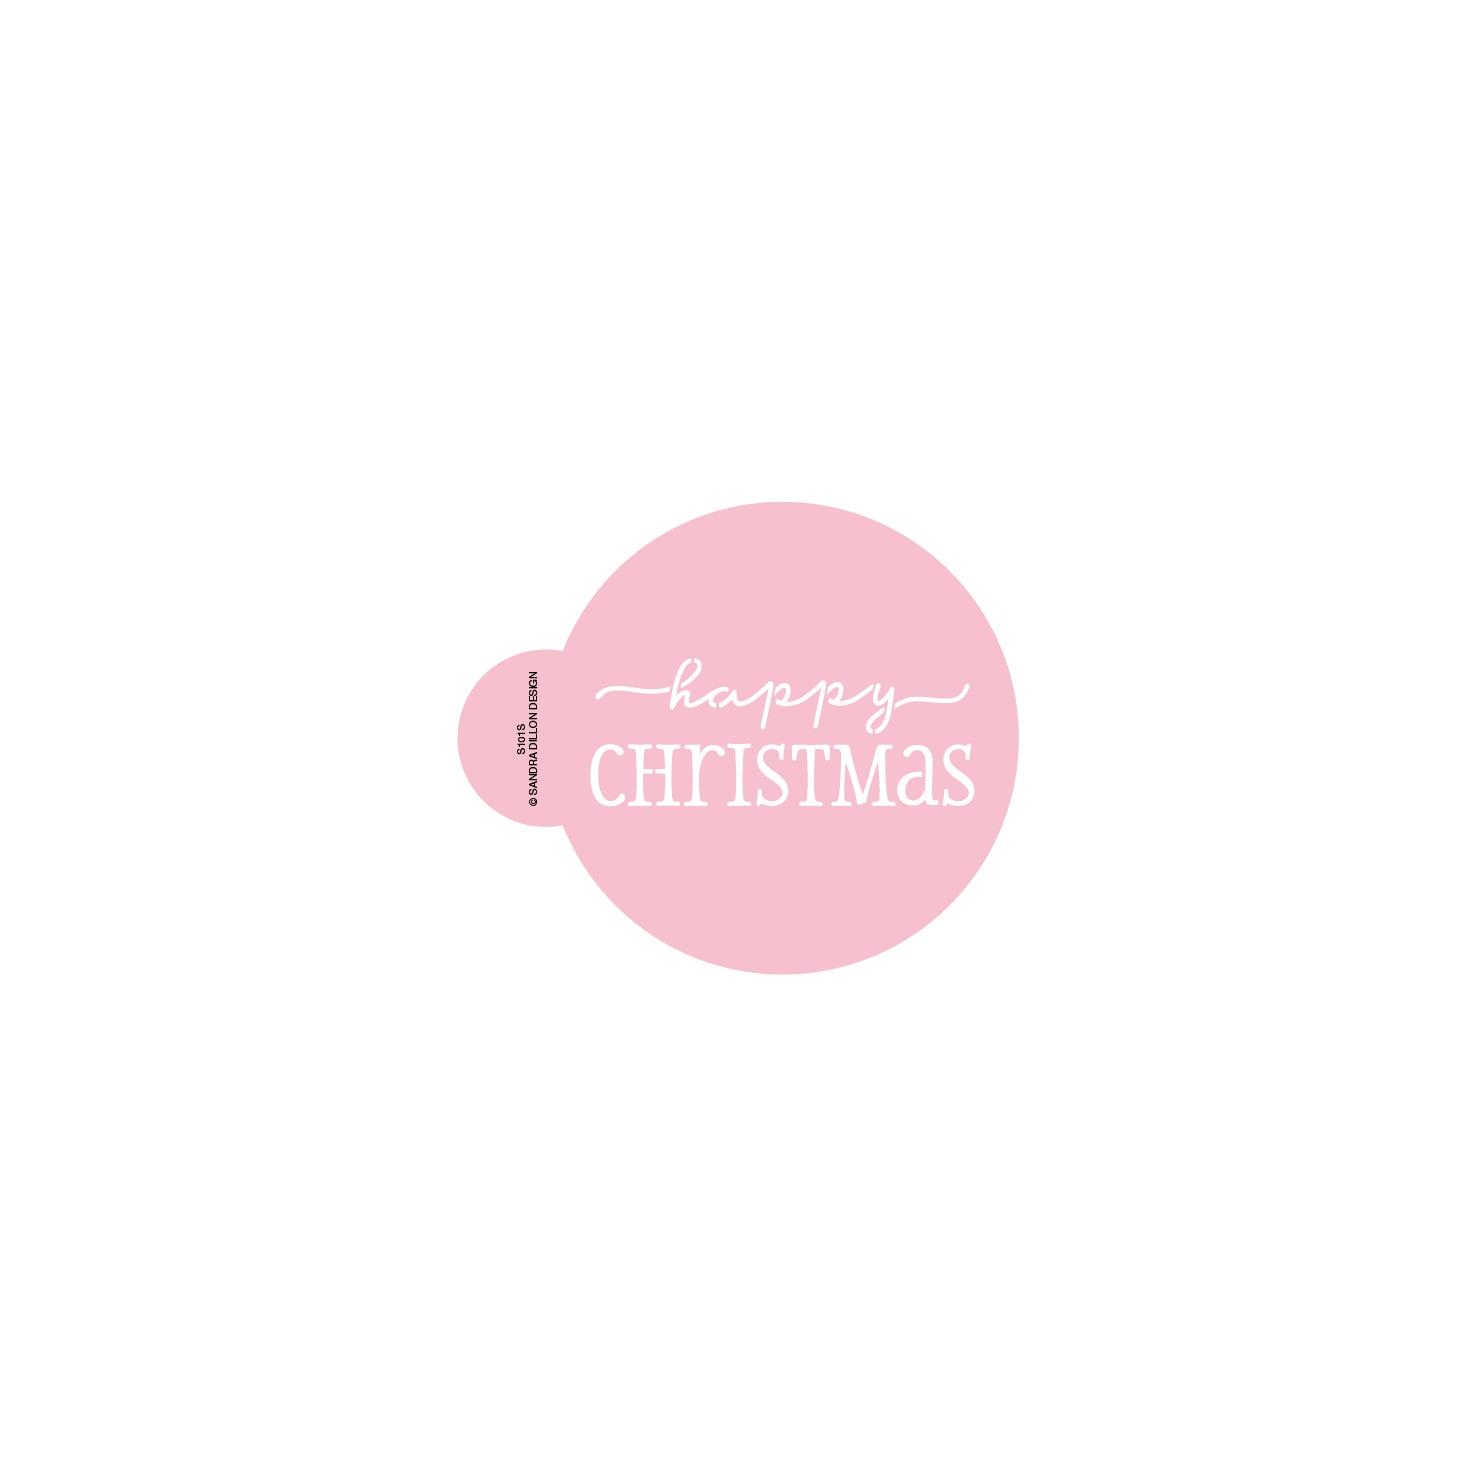 Dashing Happy Christmas Stencils (for cookies)